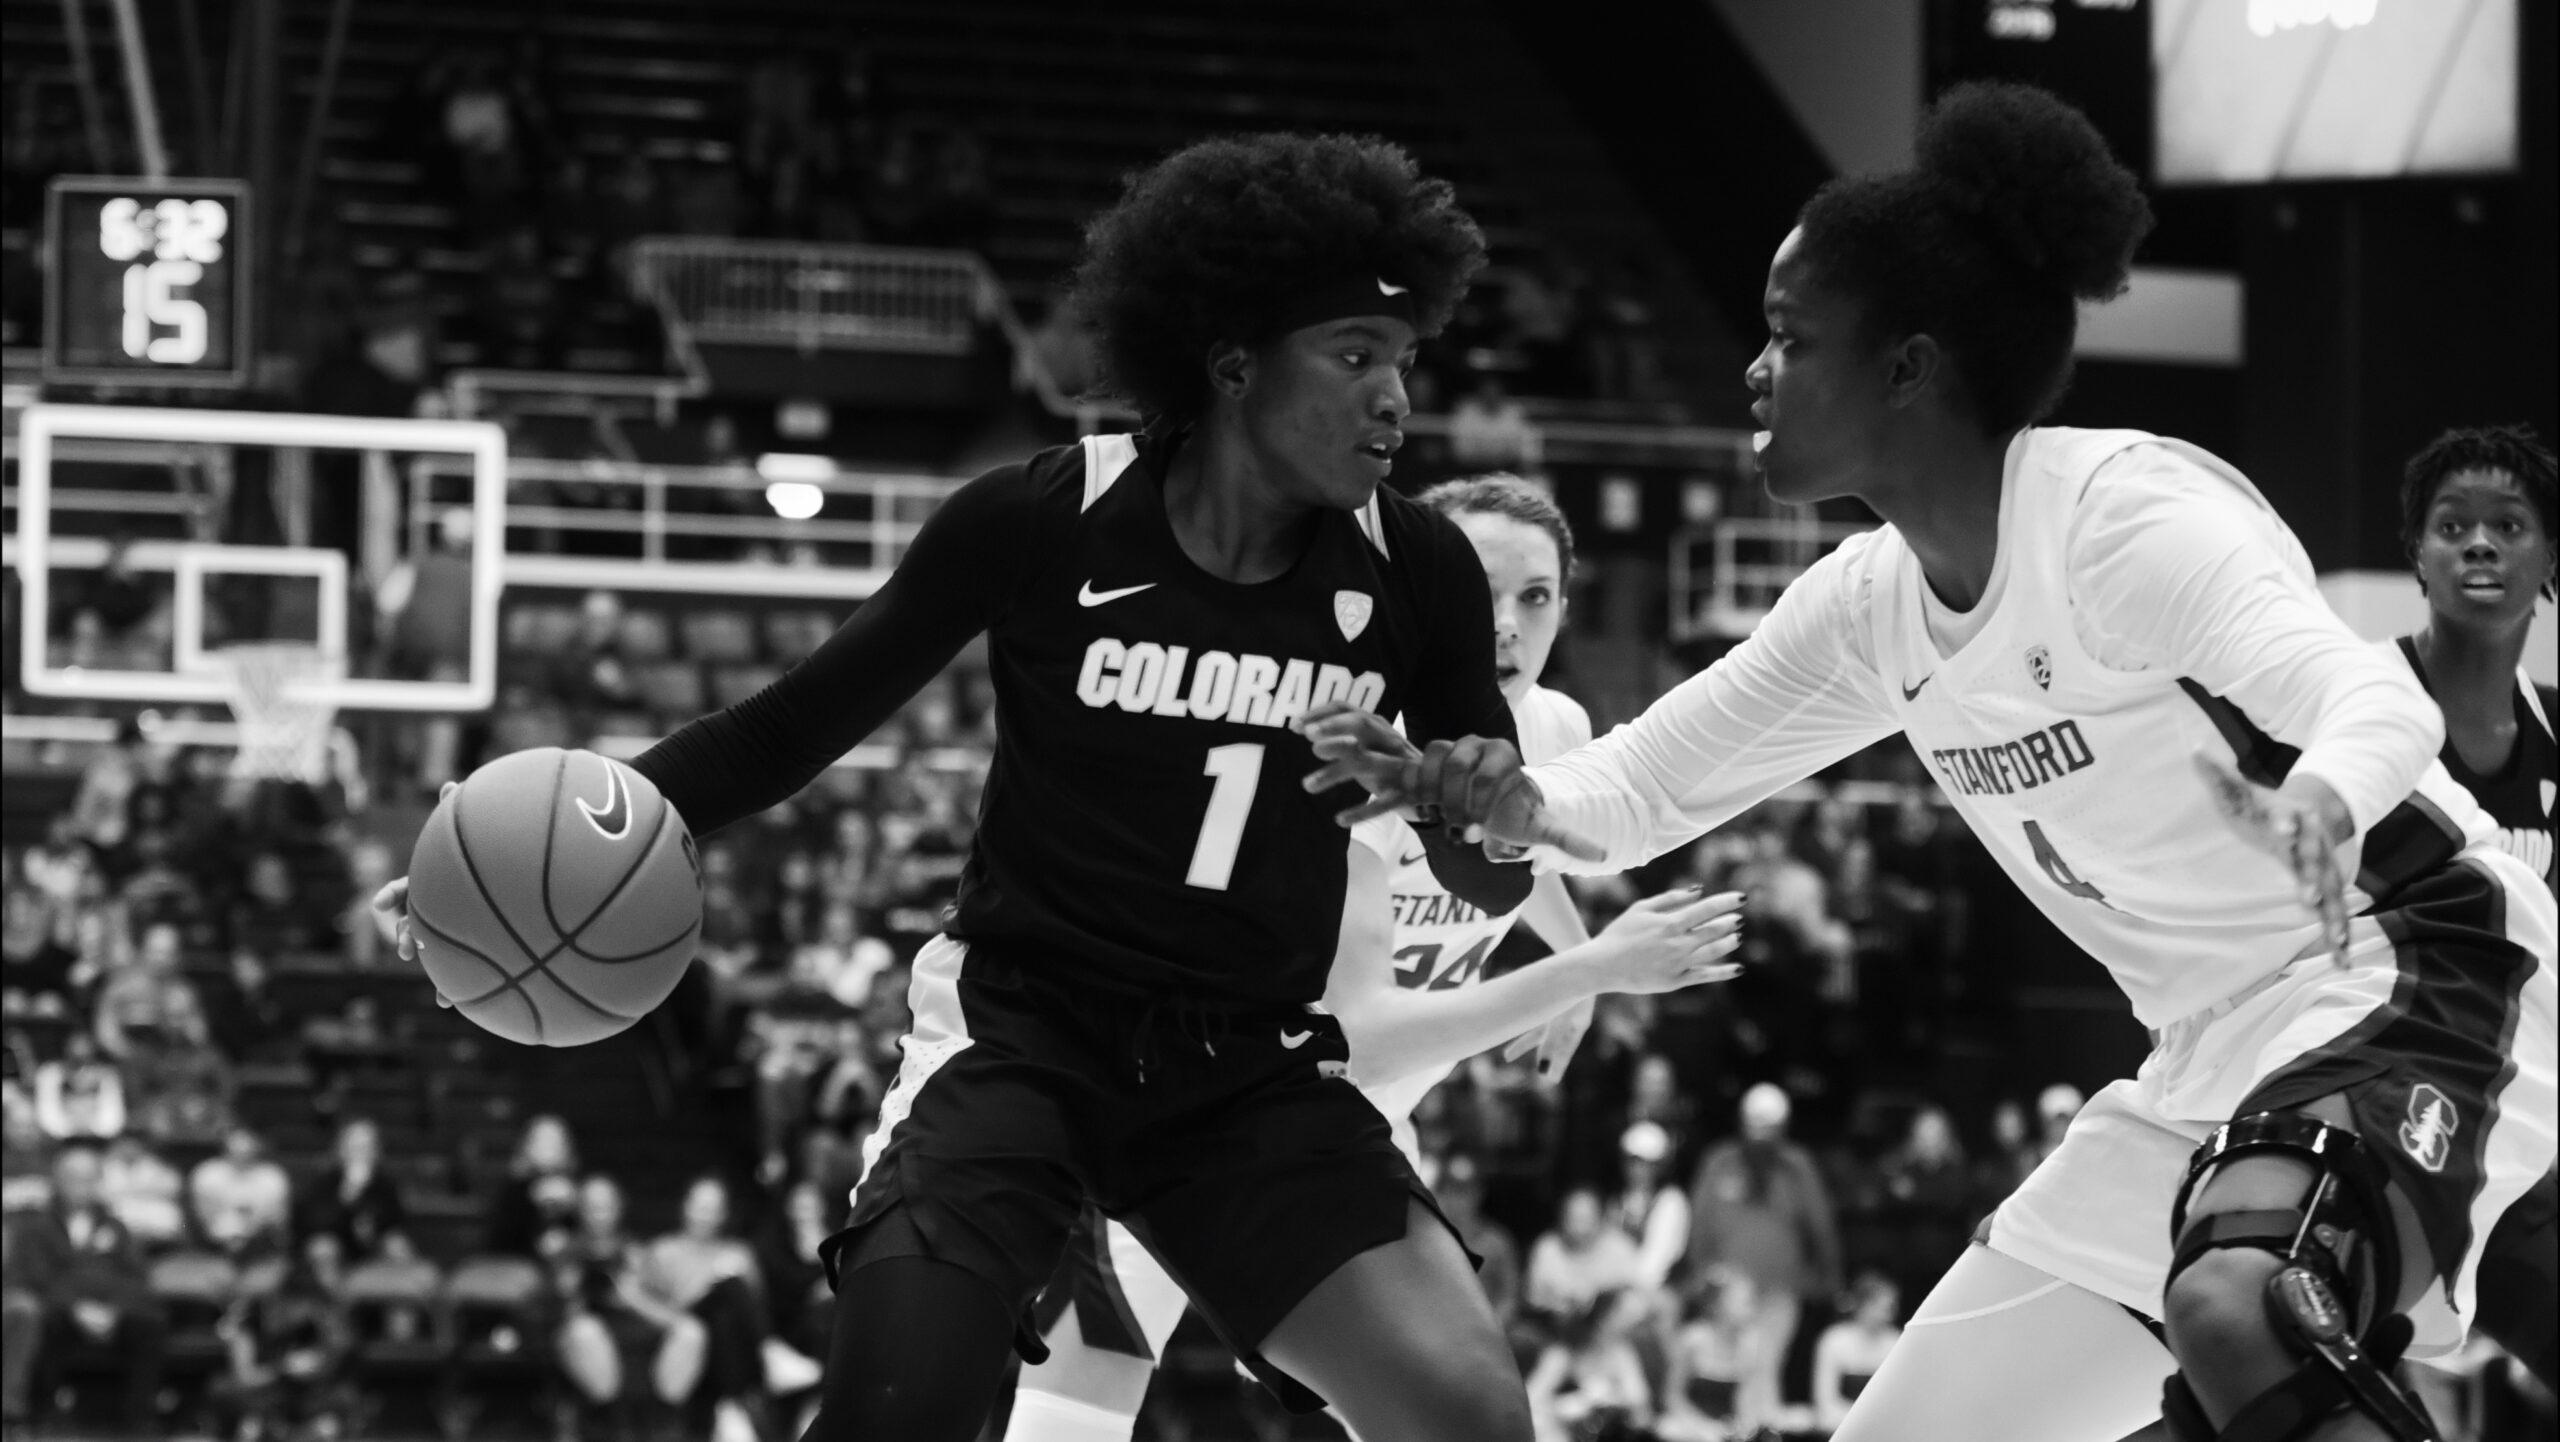 Stanford survives upset-minded Colorado in an overtime thriller, 76-68